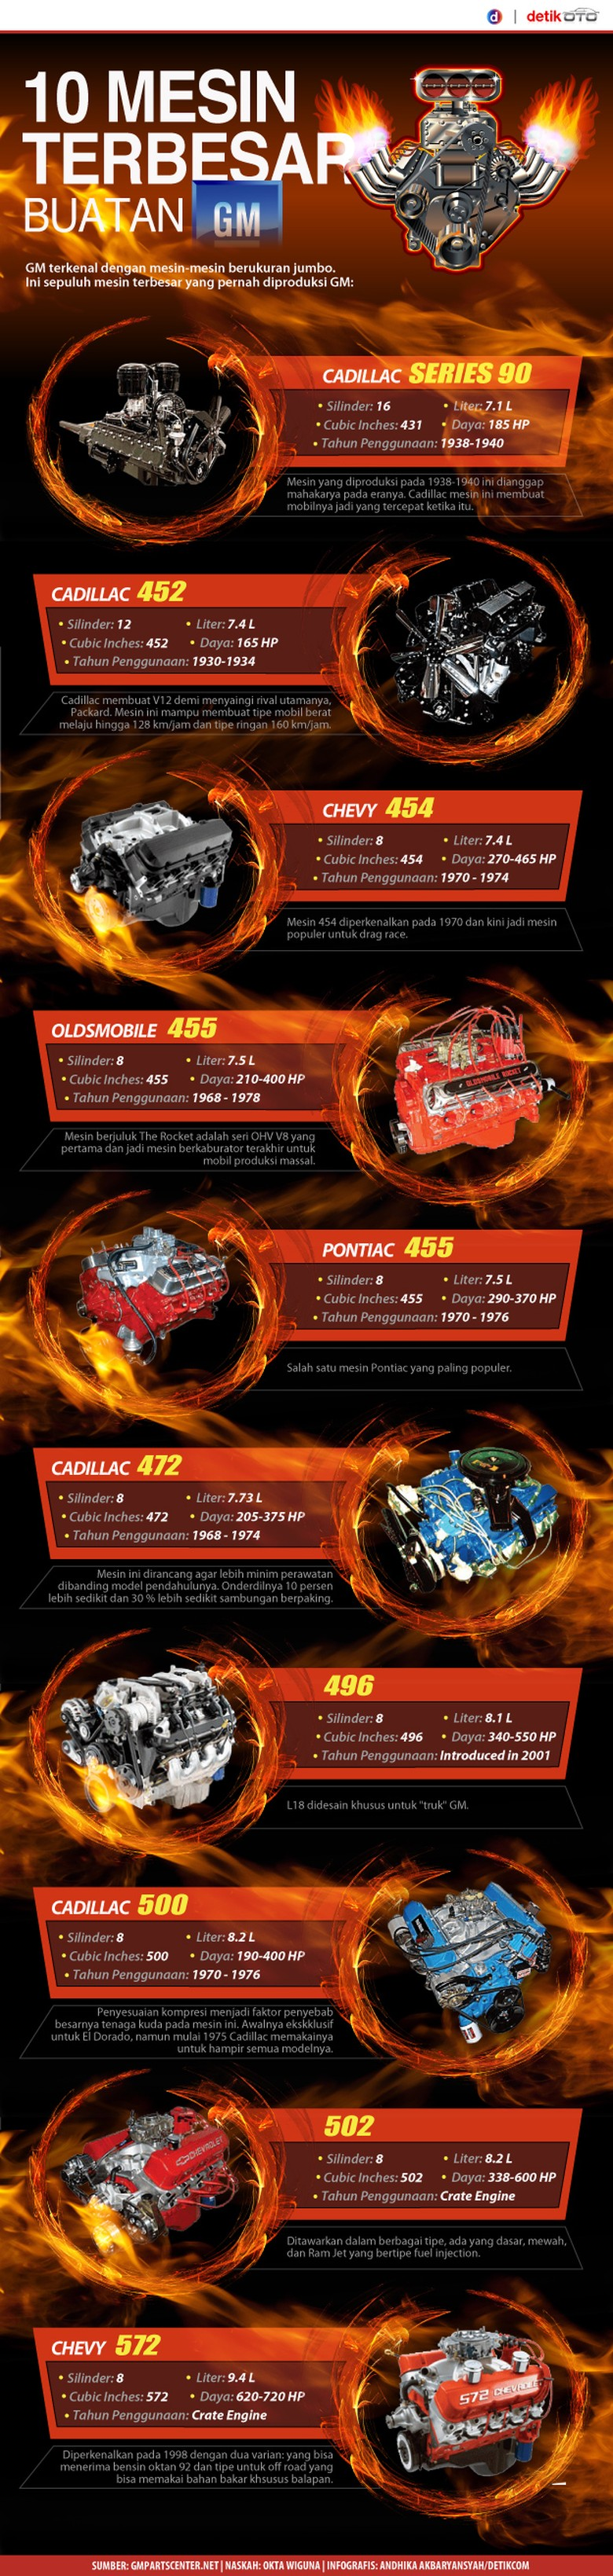 10 Mesin cc Besar GM yang Legendaris